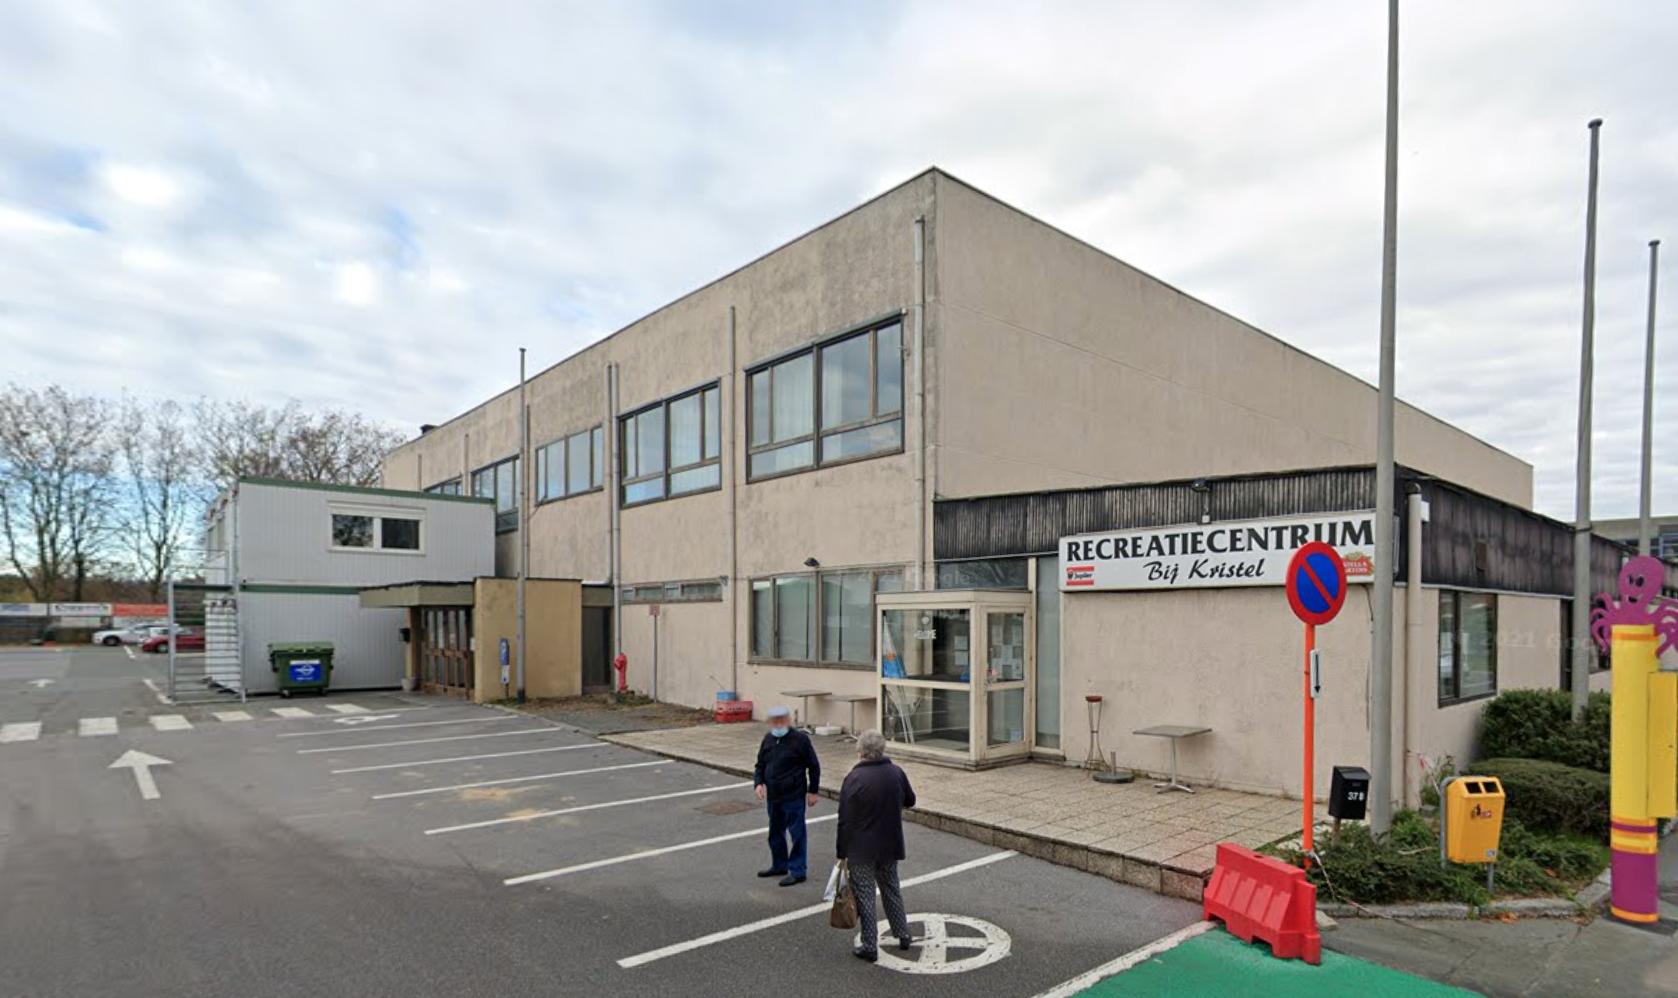 Sporthal Keperenberg in Itterbeek wordt afgebroken